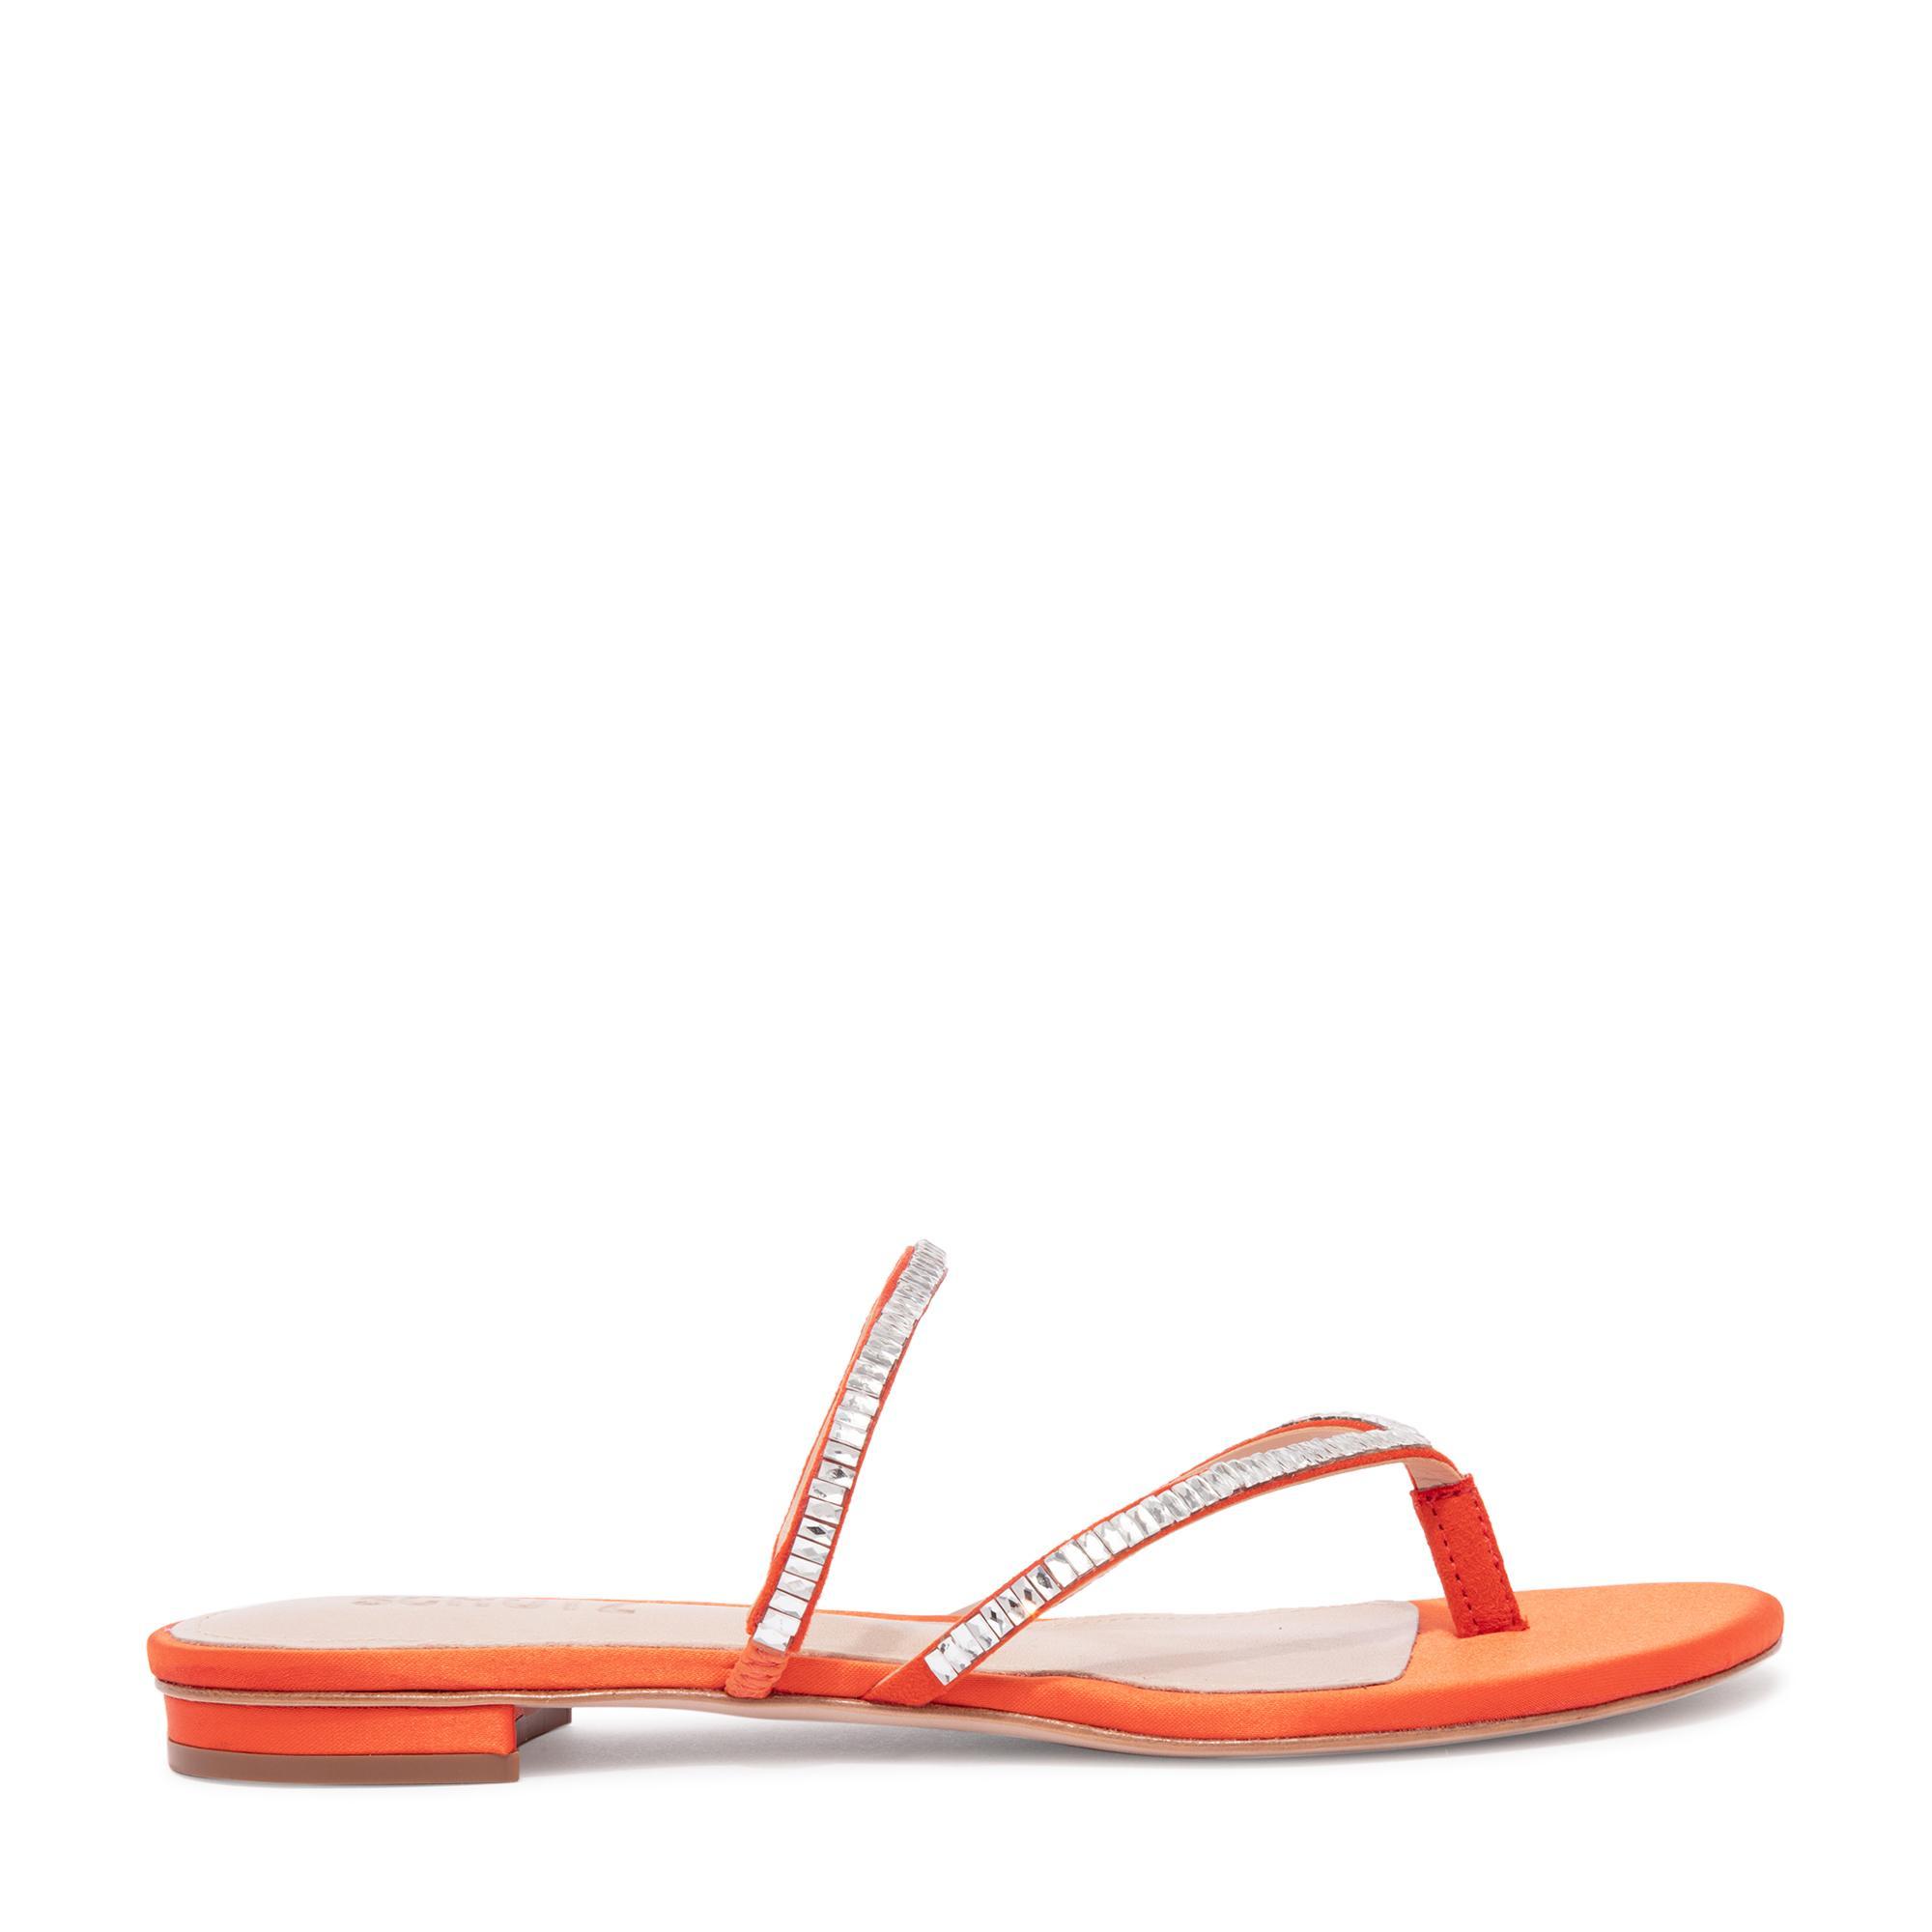 Marileide sandals